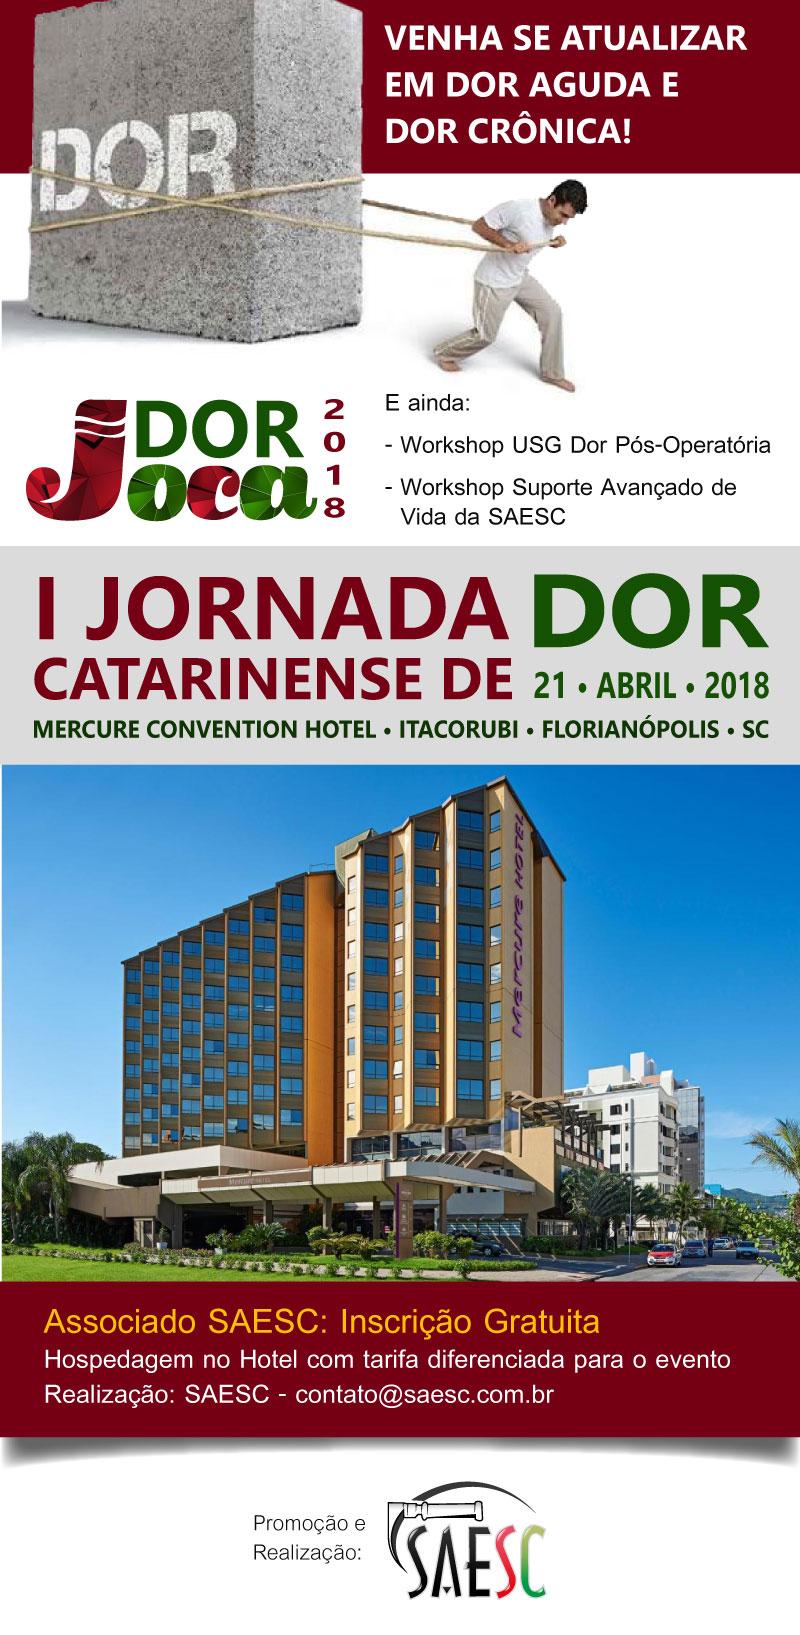 I Jornada Catarinense de Dor